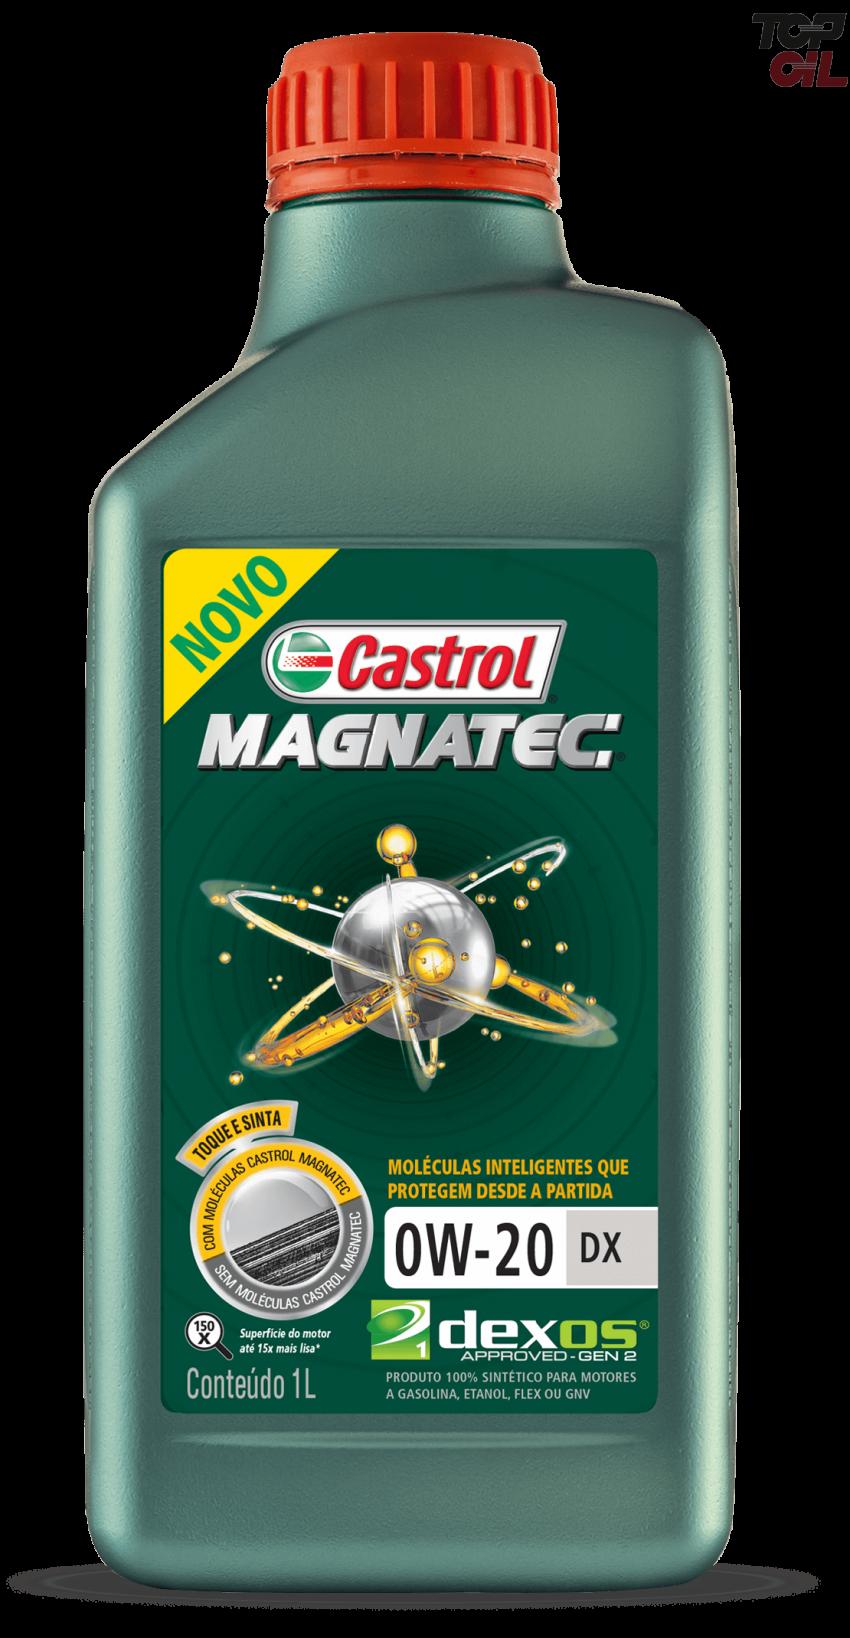 Oleo de motor Castrol MAGNATEC 0W20 Sintetico DX SP 1L